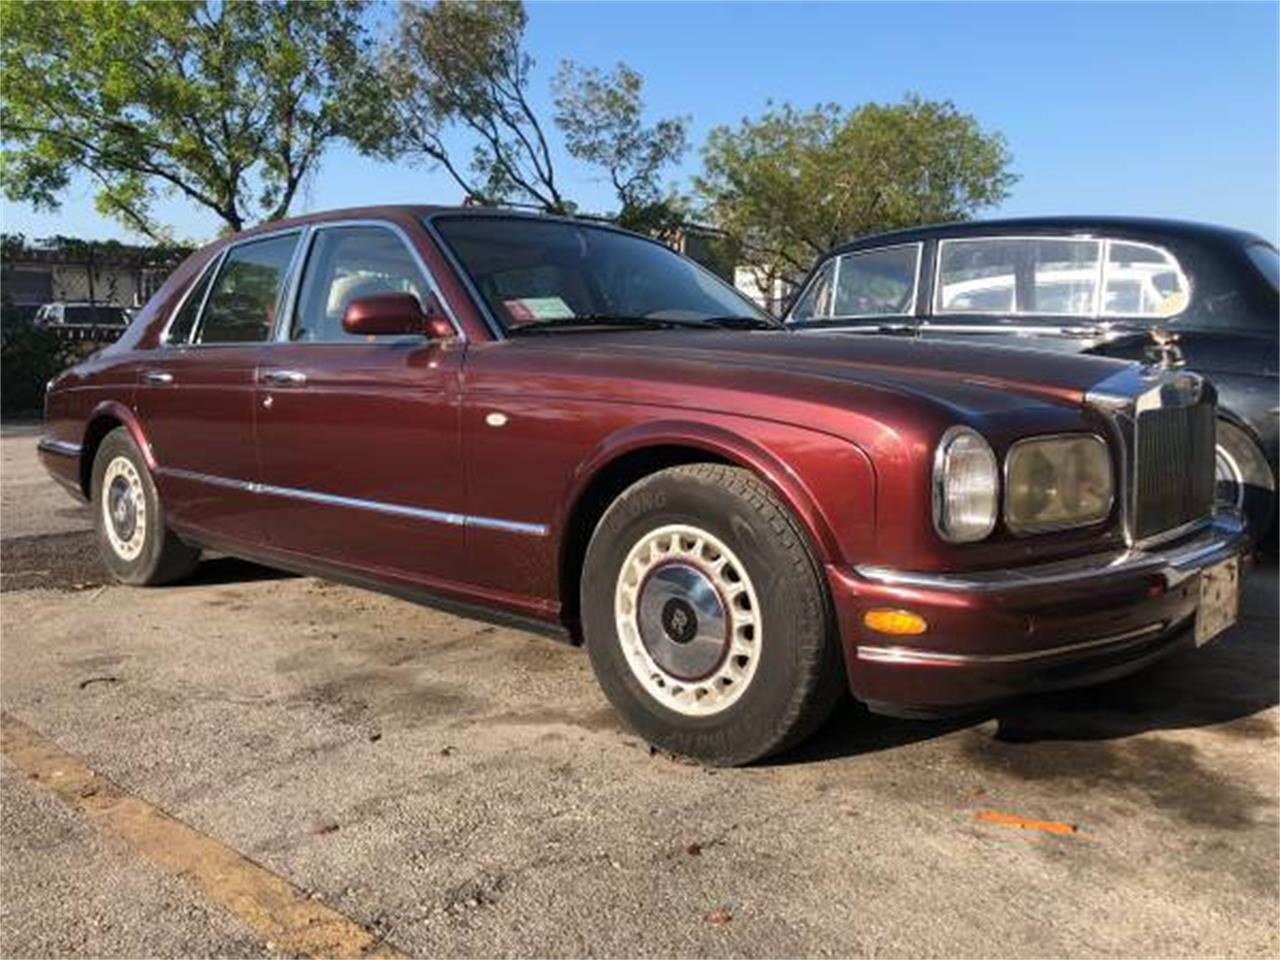 2000 Rolls Royce Silver Seraph For Sale Classiccars Com Cc 1140958